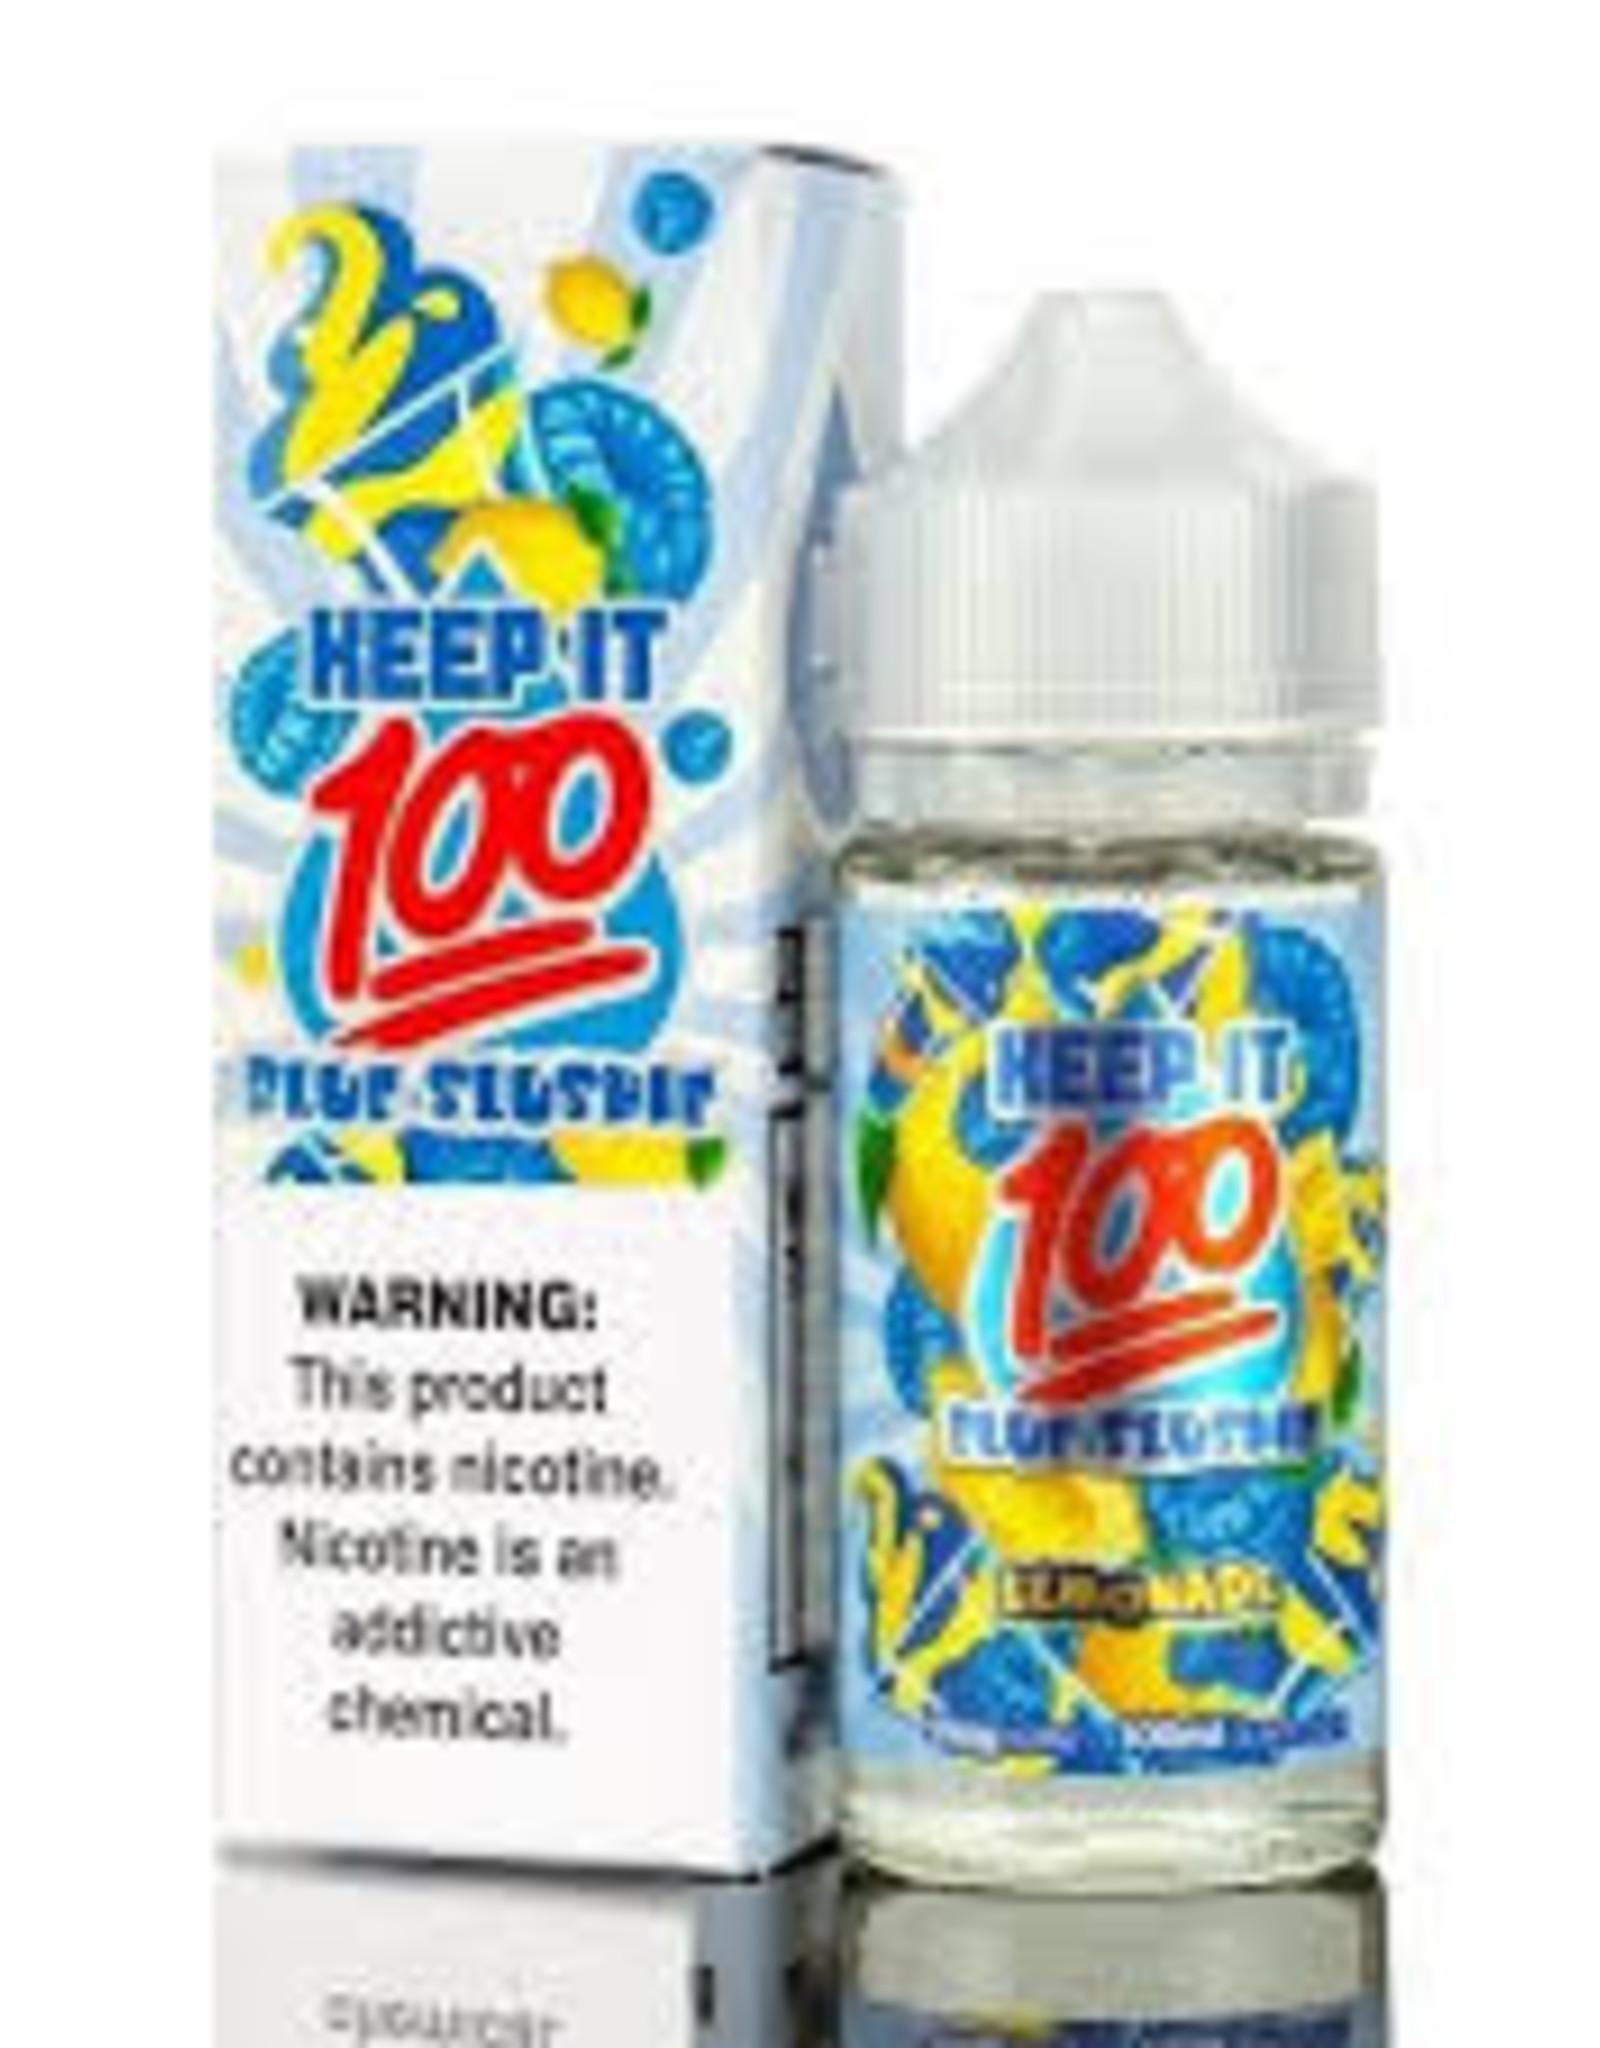 Keep It 100 OG Summer (Blue Slushie Lemonade) By Keep It 100